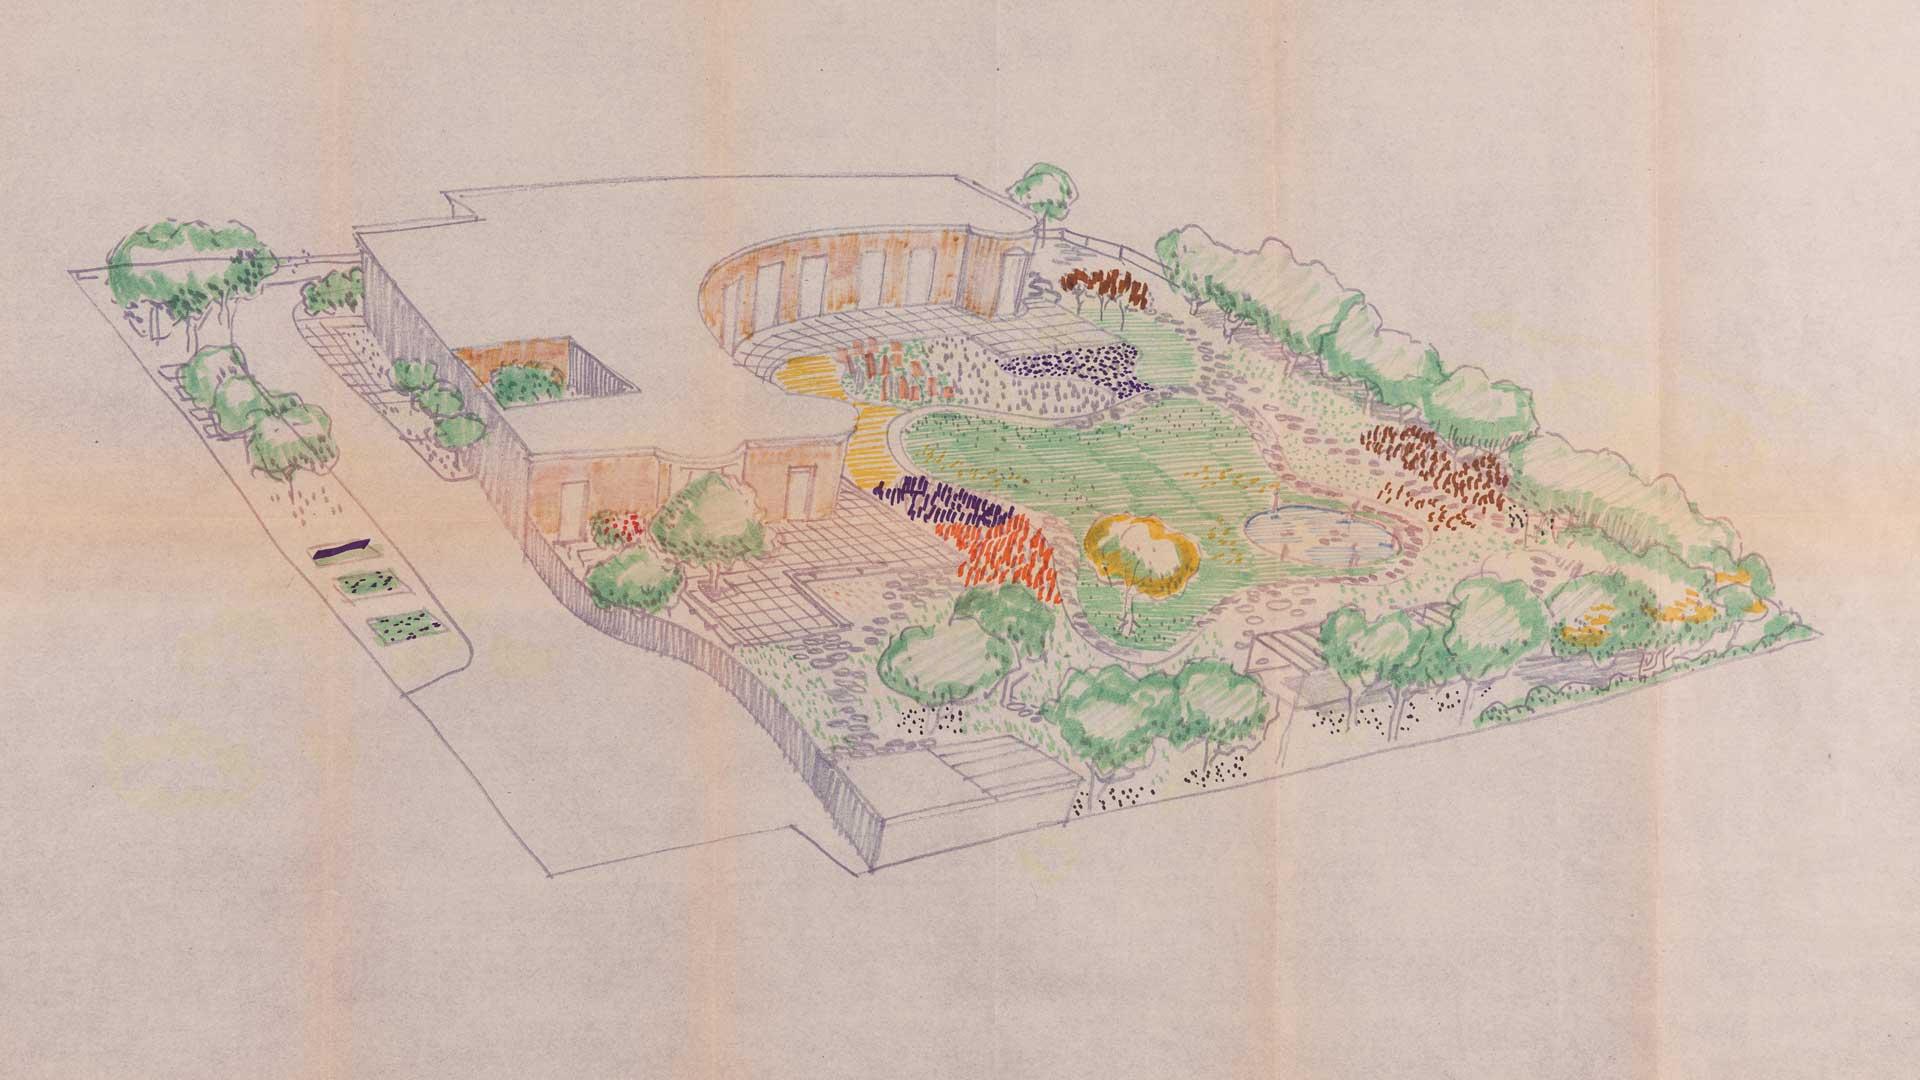 o Jardim da Casa-museu Ema Klabin